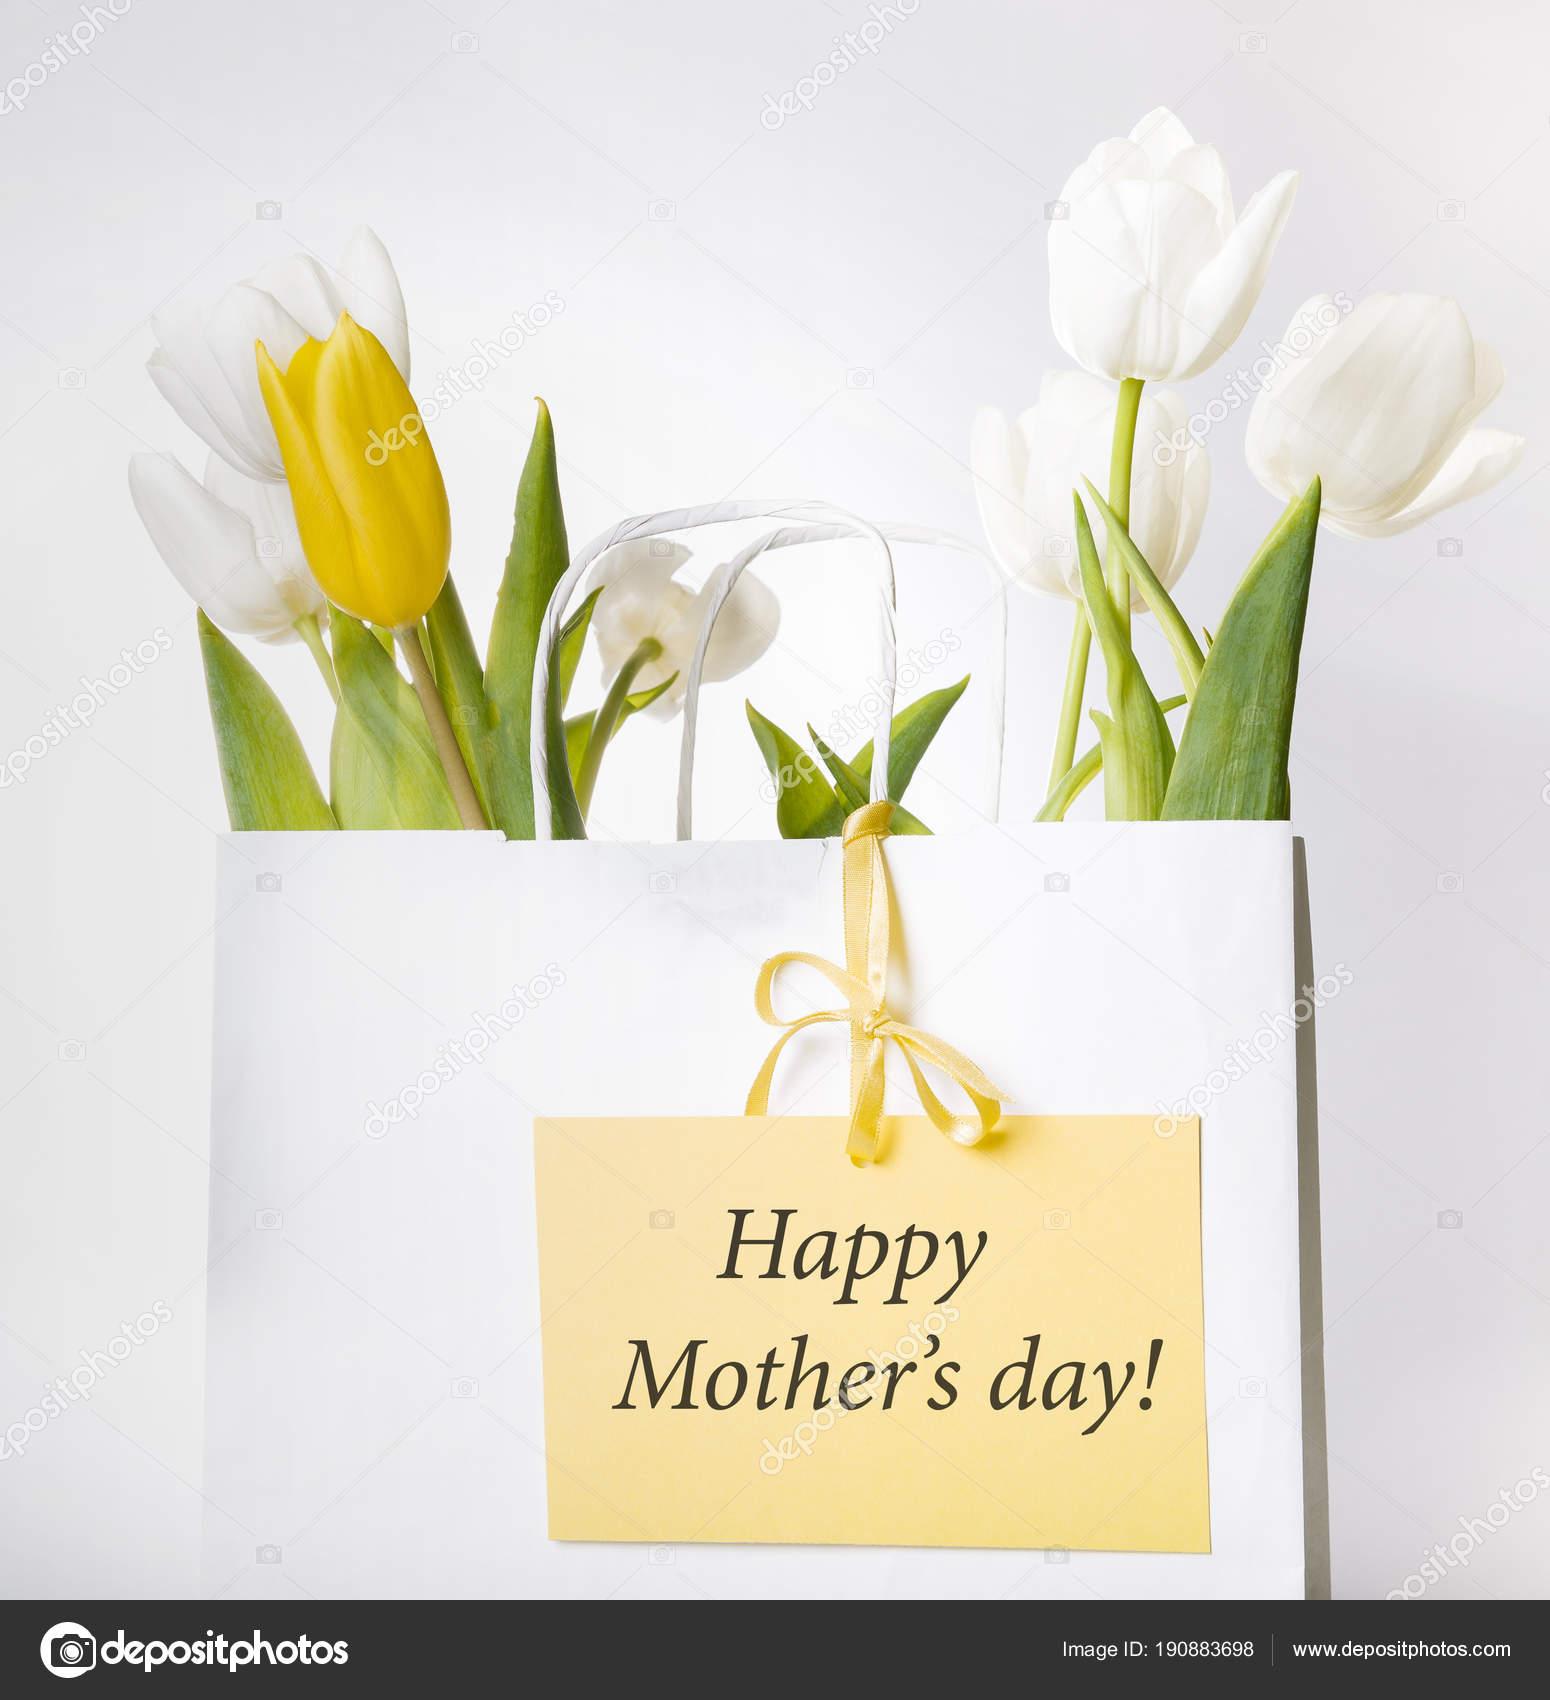 de187f559a Μητέρες ημέρα κάρτα με μπουκέτο της άνοιξης τα λουλούδια λευκά